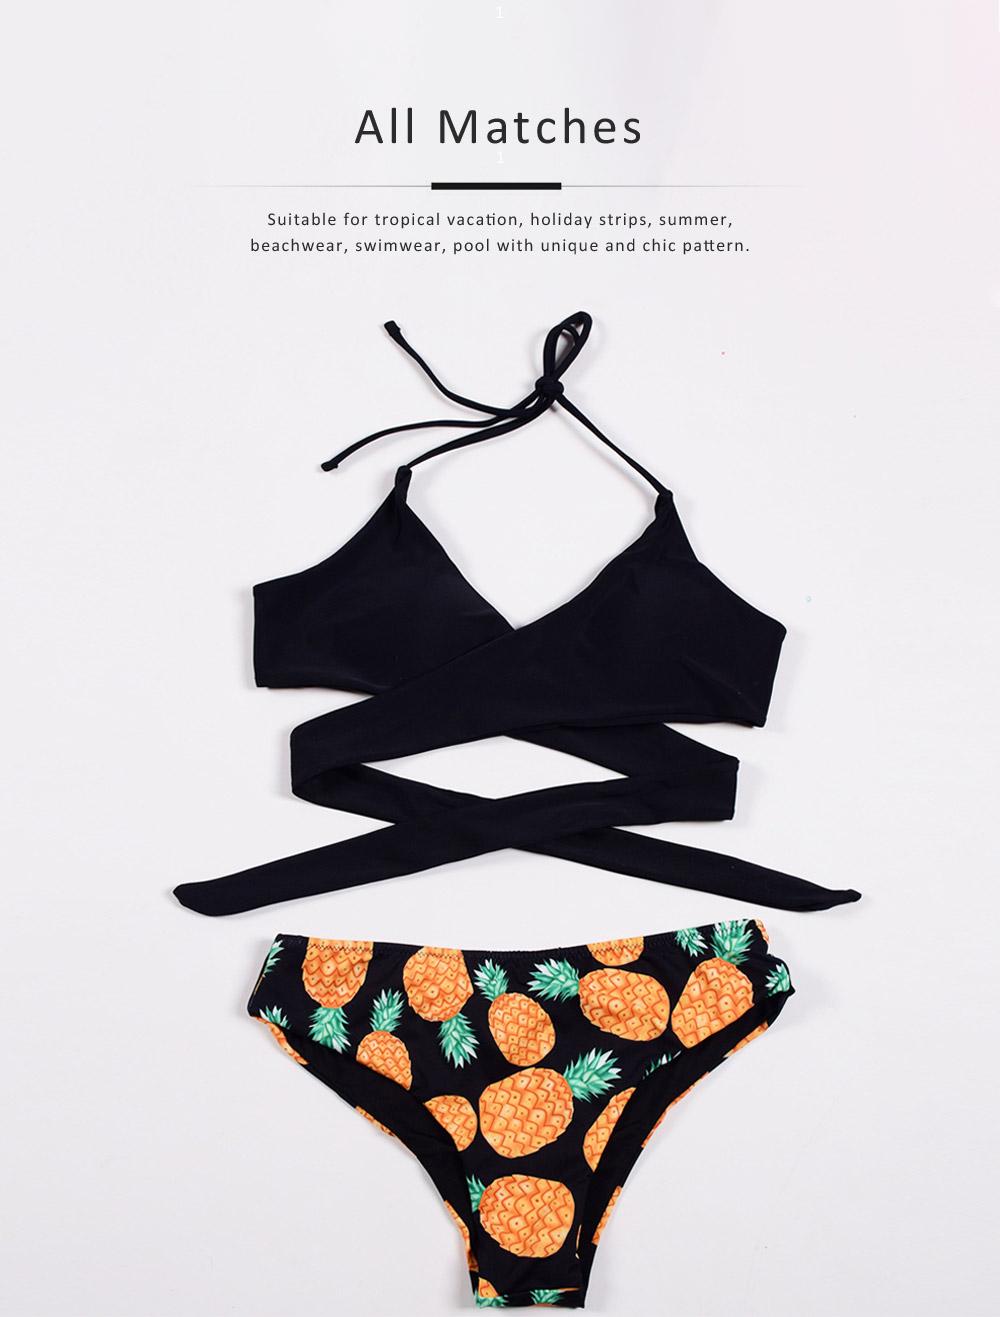 Women's Swimwear V-Neck Sexy Padded Halter Bandage Bikini Two Piece Swimsuits High Waist Bathing Suit 2